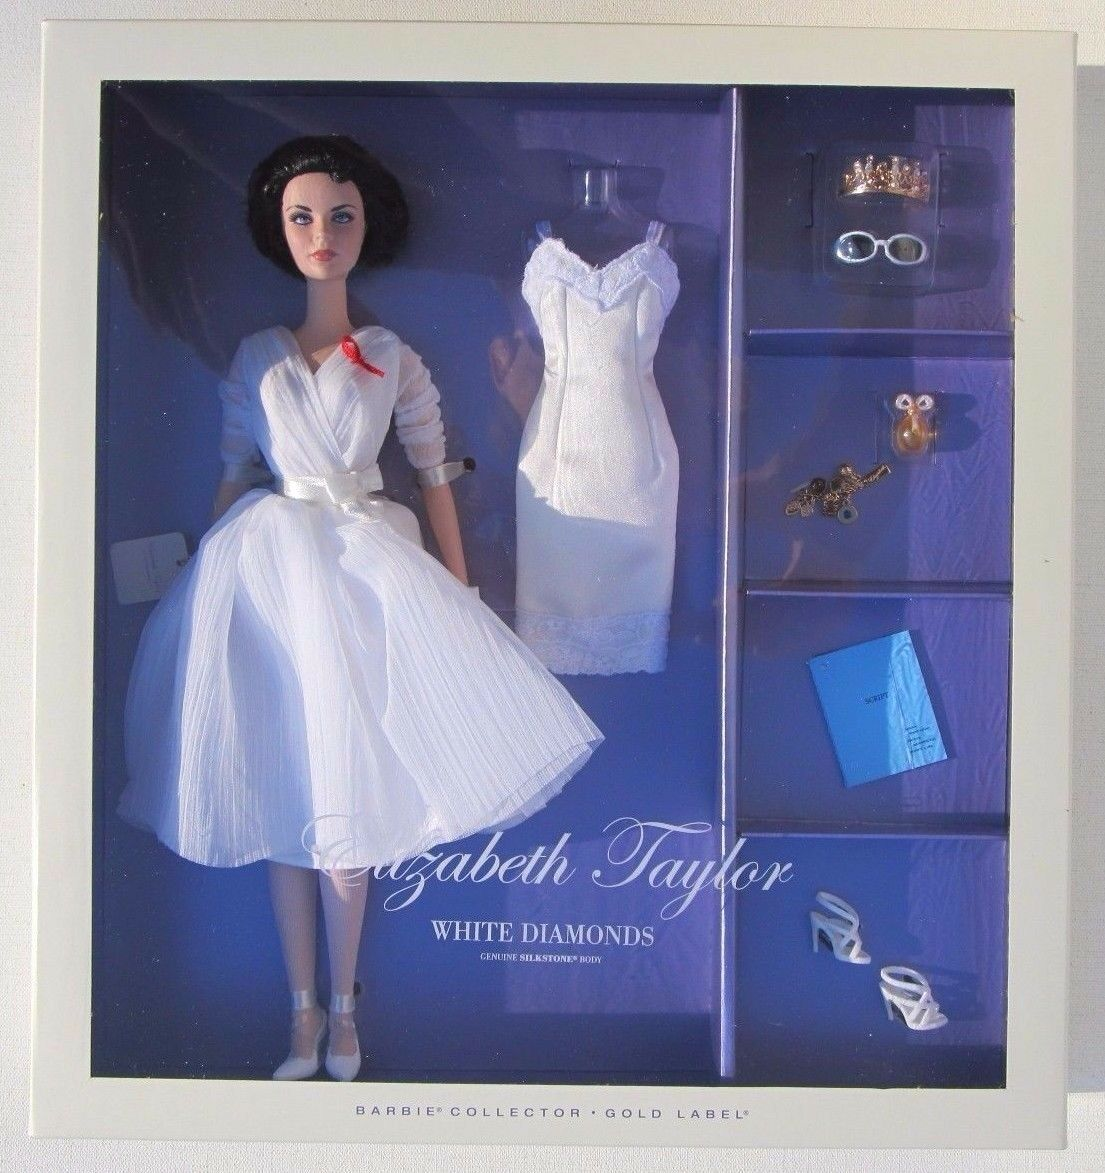 Elizabeth Taylor blanco Diamonds Genuino cuerpo Silkstone Barbie oro Label 2012